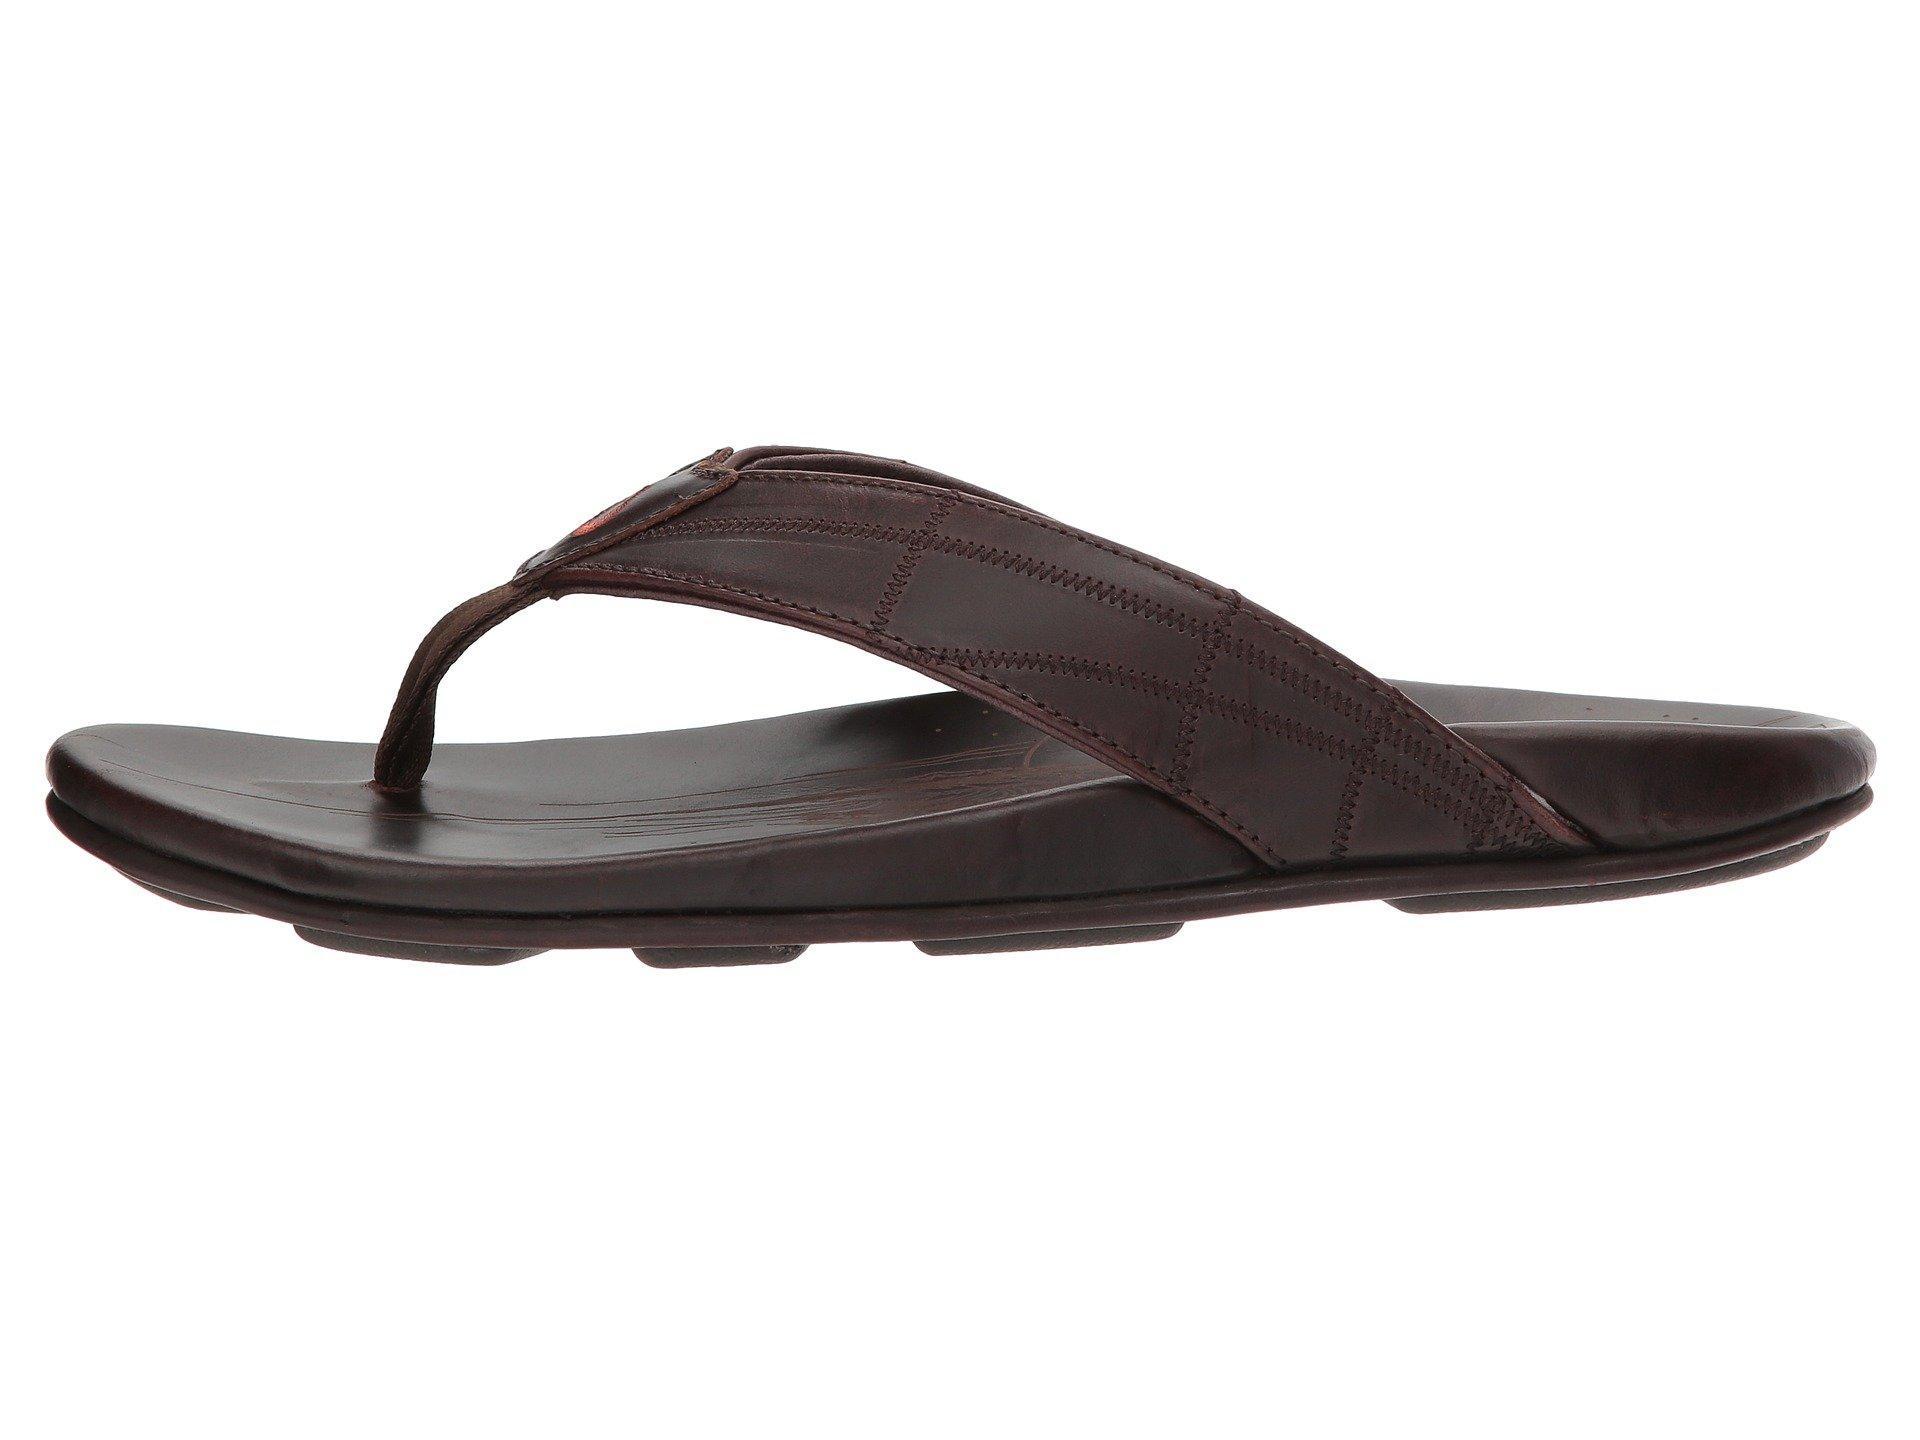 e63e0ed5c67 Lyst - Olukai Hokule a Kia (tan tan) Men s Sandals in Brown for Men